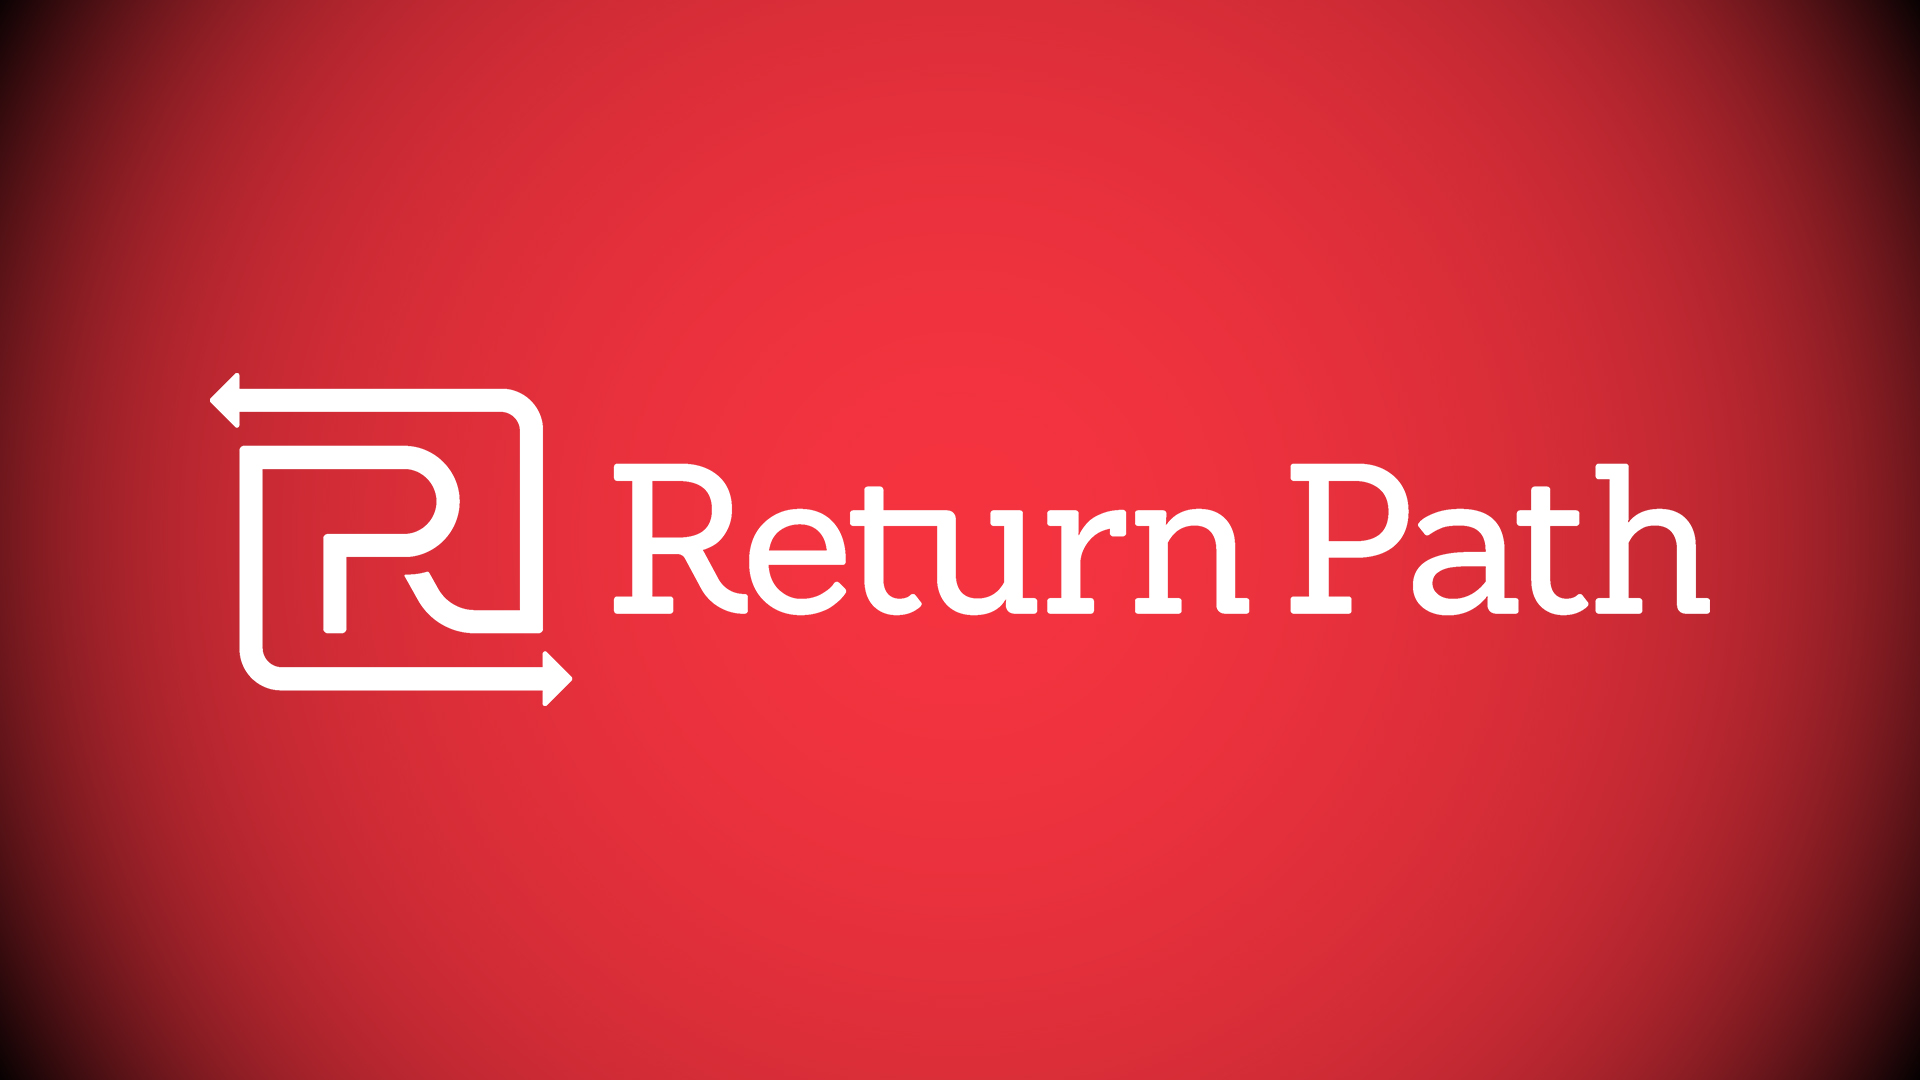 return-path-logo-1920